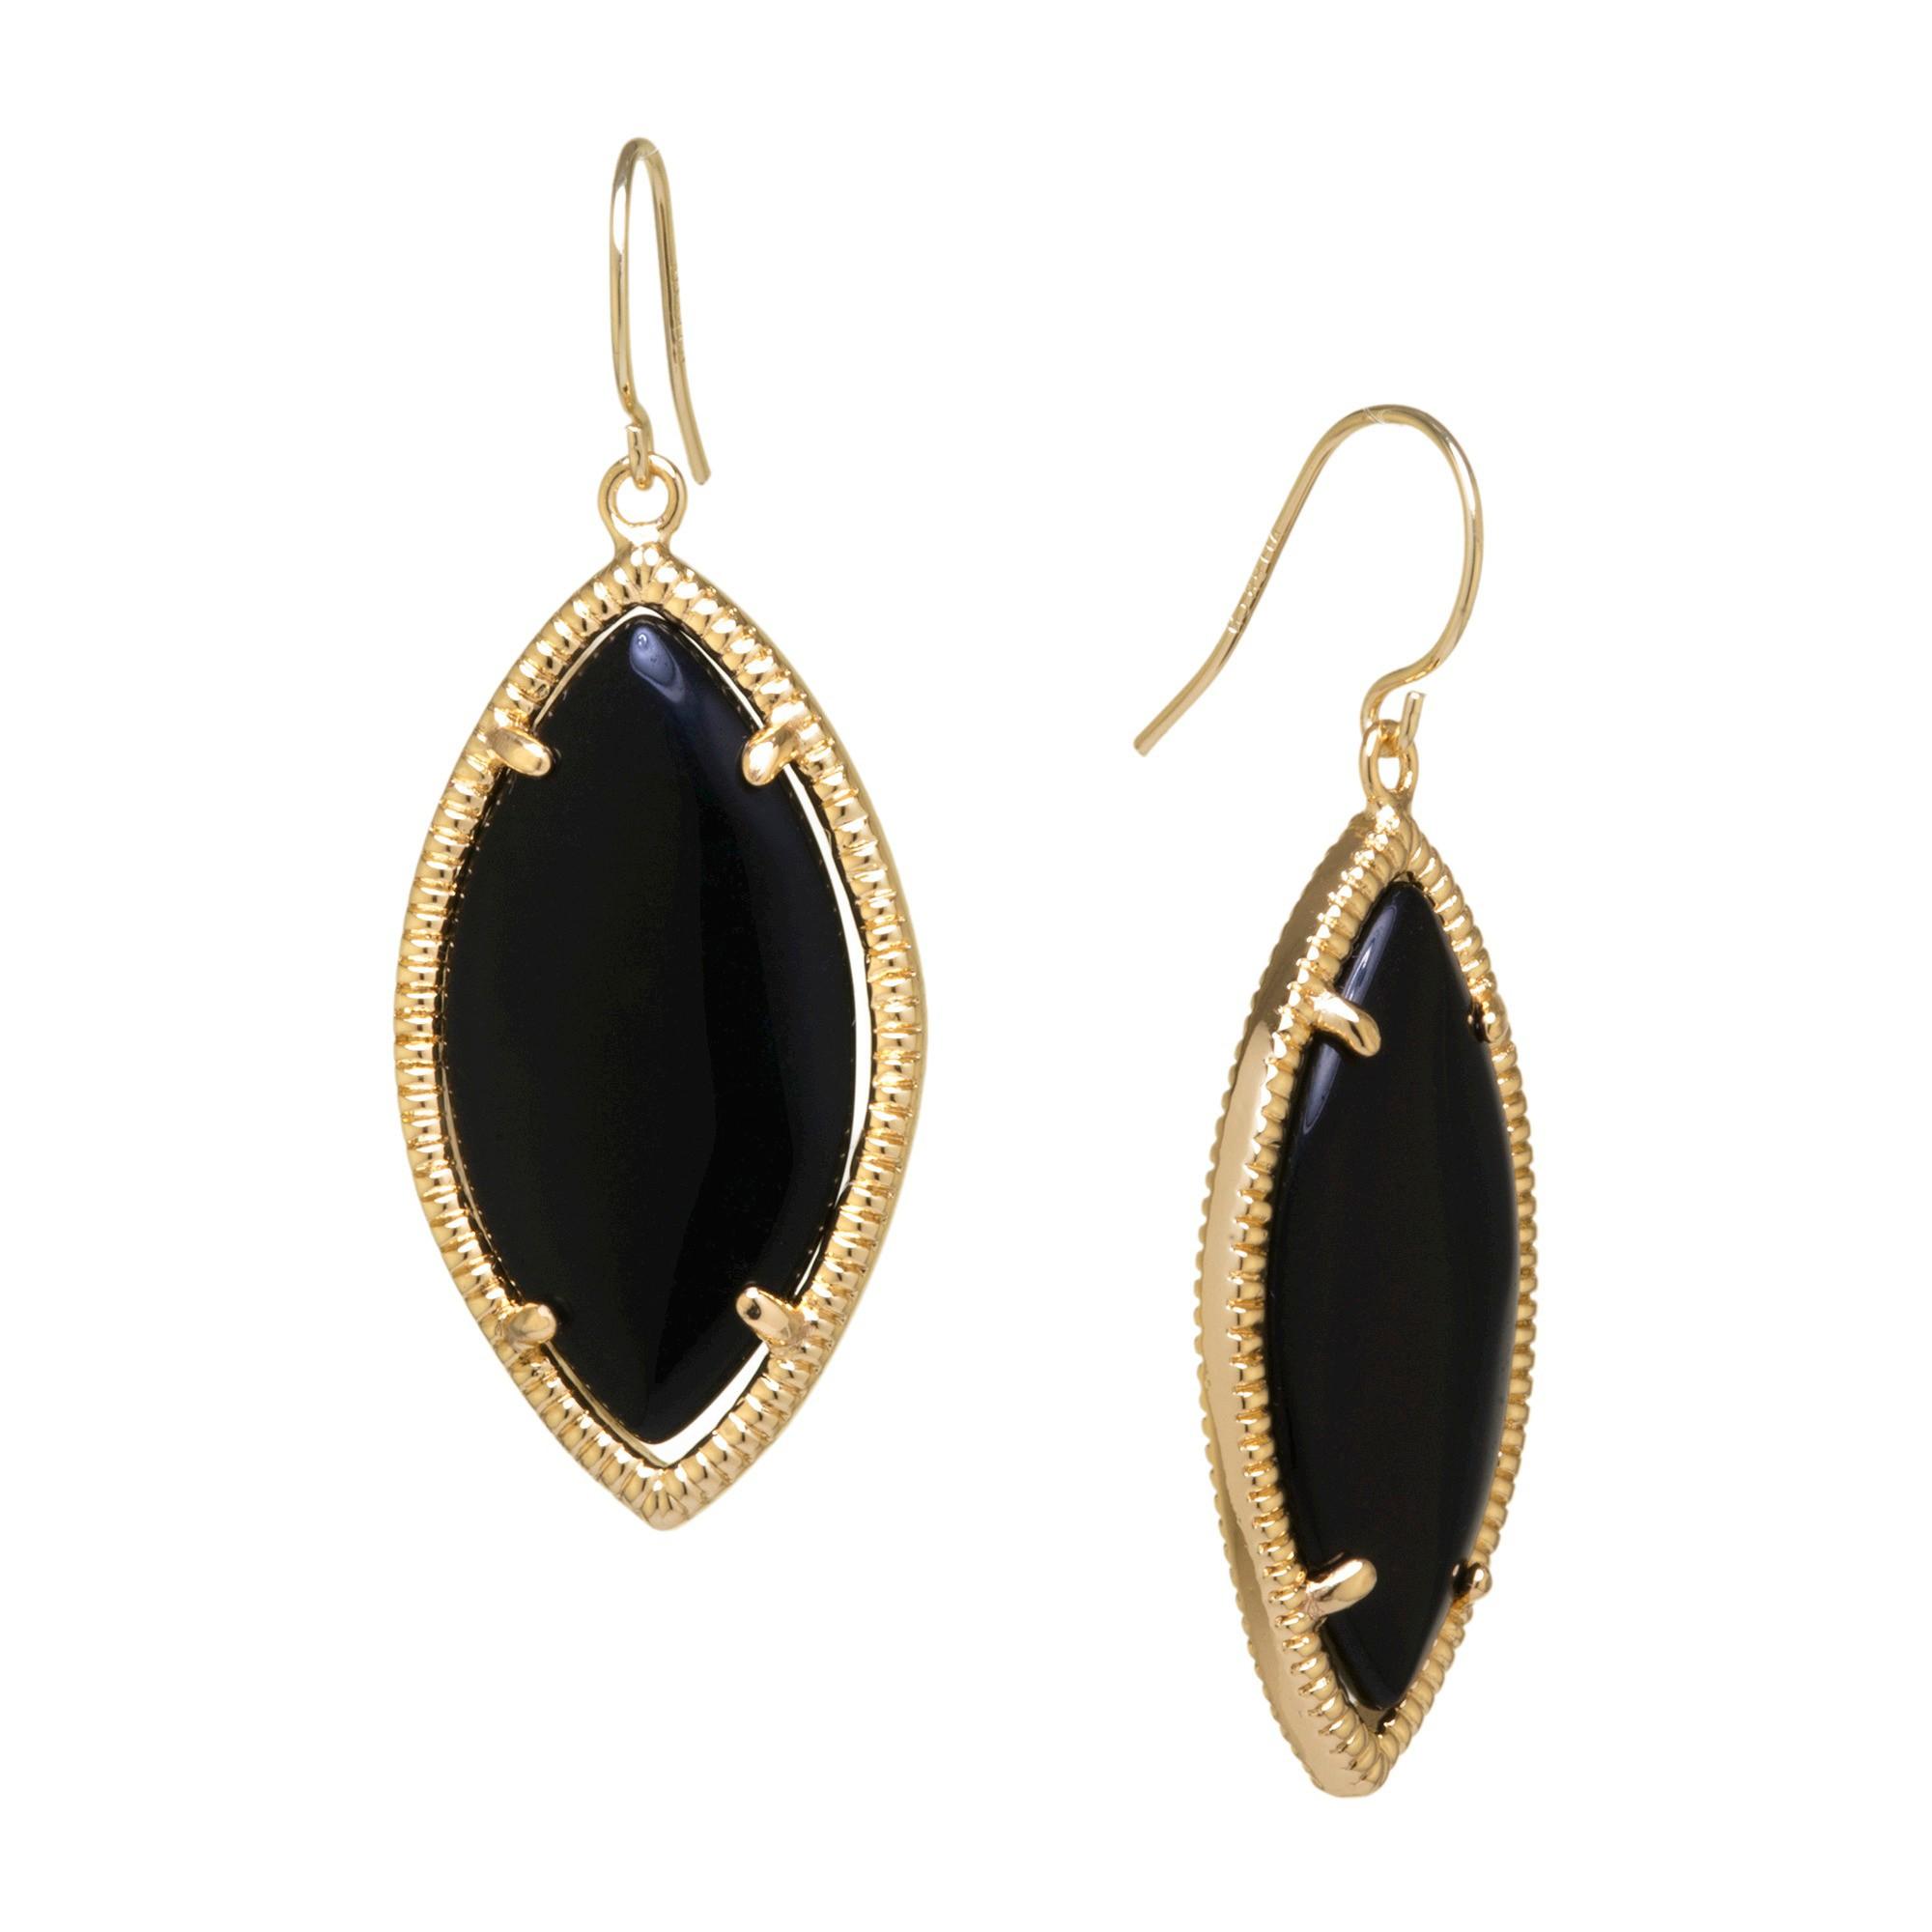 Gold Plated Black Drop Earrings - Gold/Black, Size: L: 47mm x W: 18mm